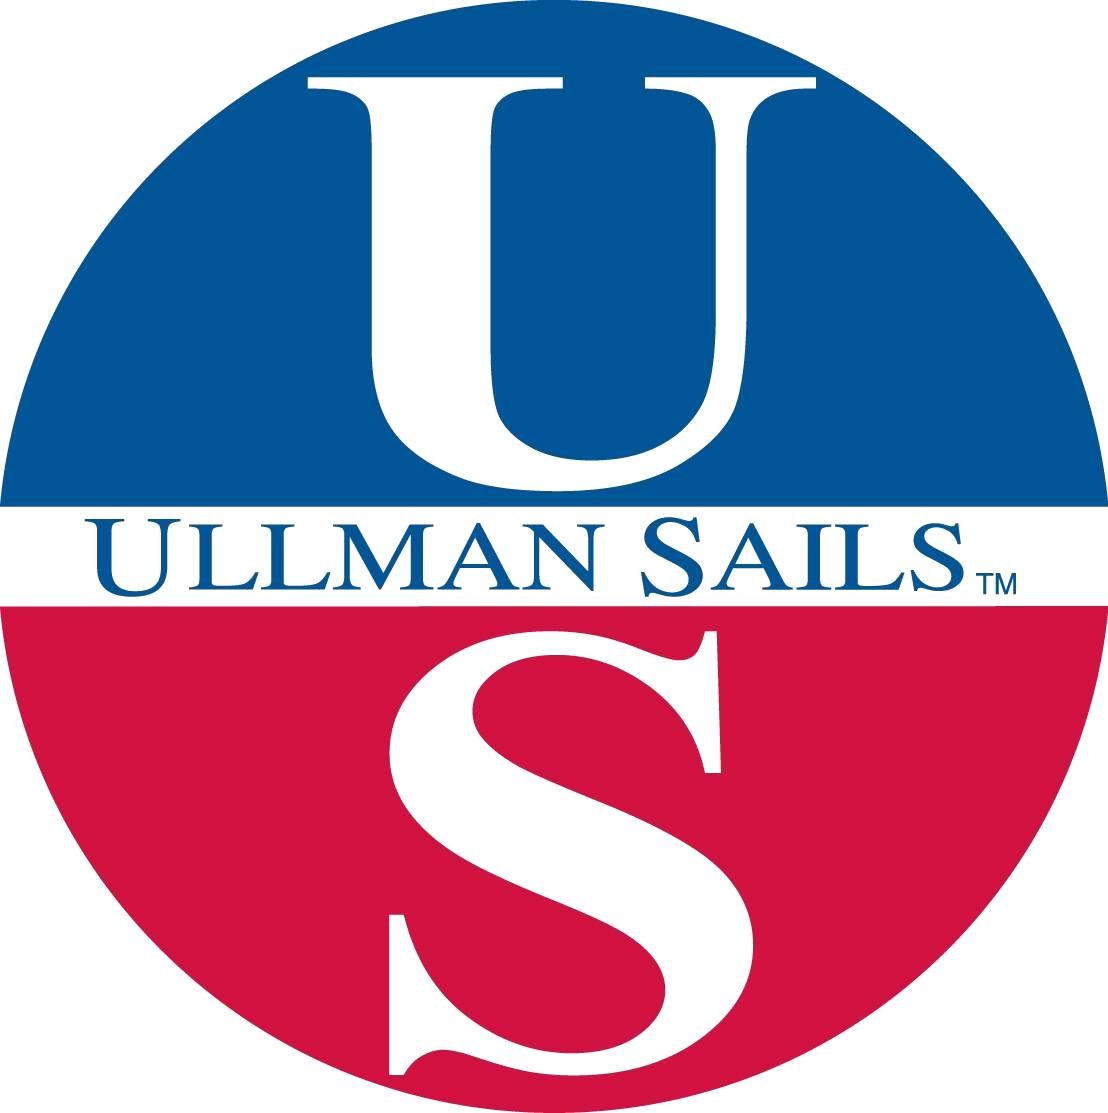 Ullman Sails Benelux